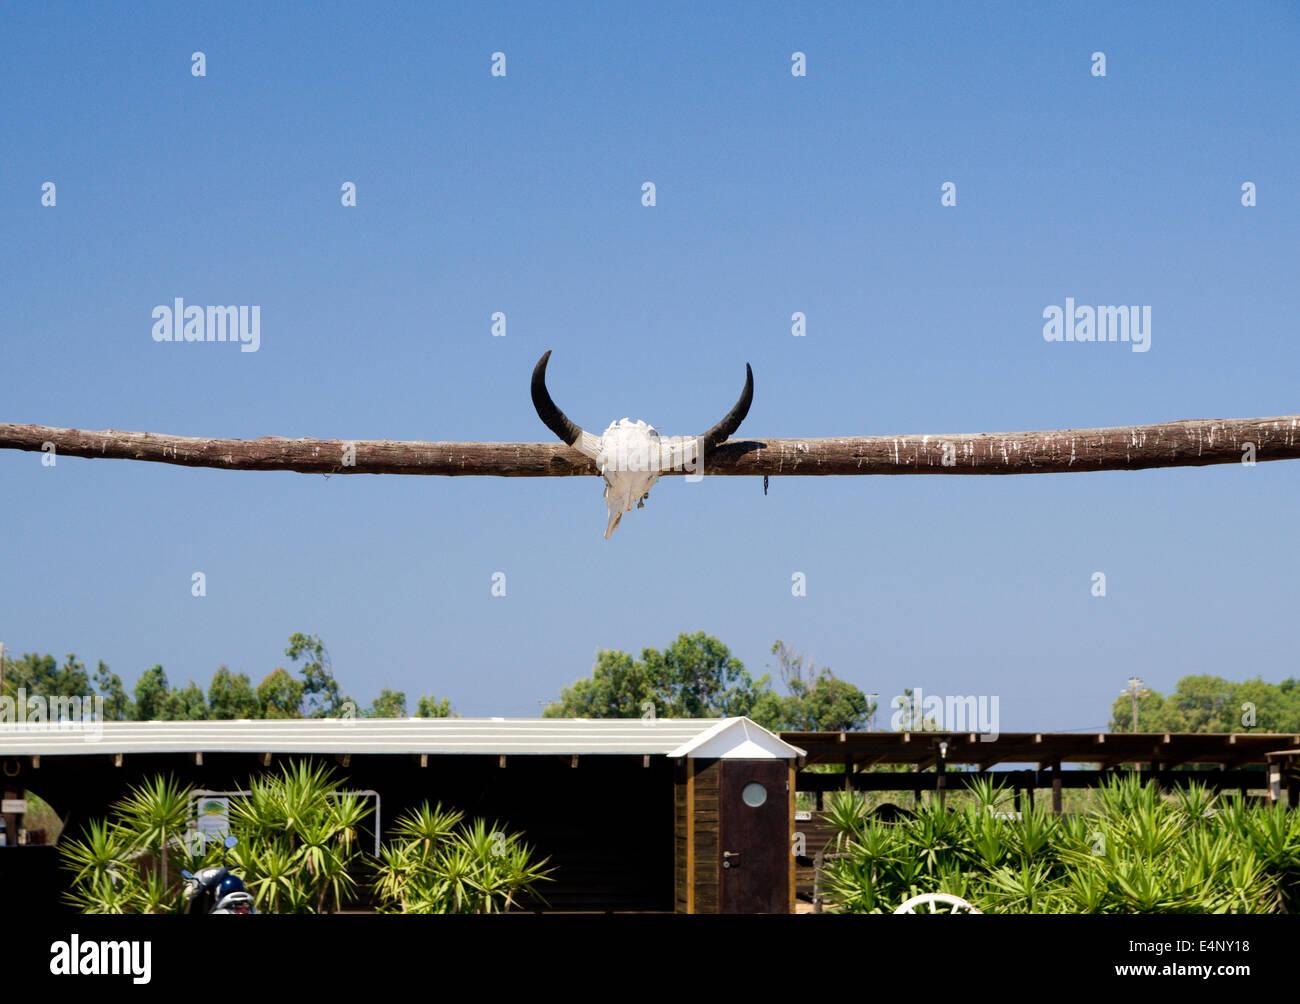 Horns above gateway to the Salt Lake Stables, Tingaki, Kos Island, Dodecanese Islands, Greece. - Stock Image